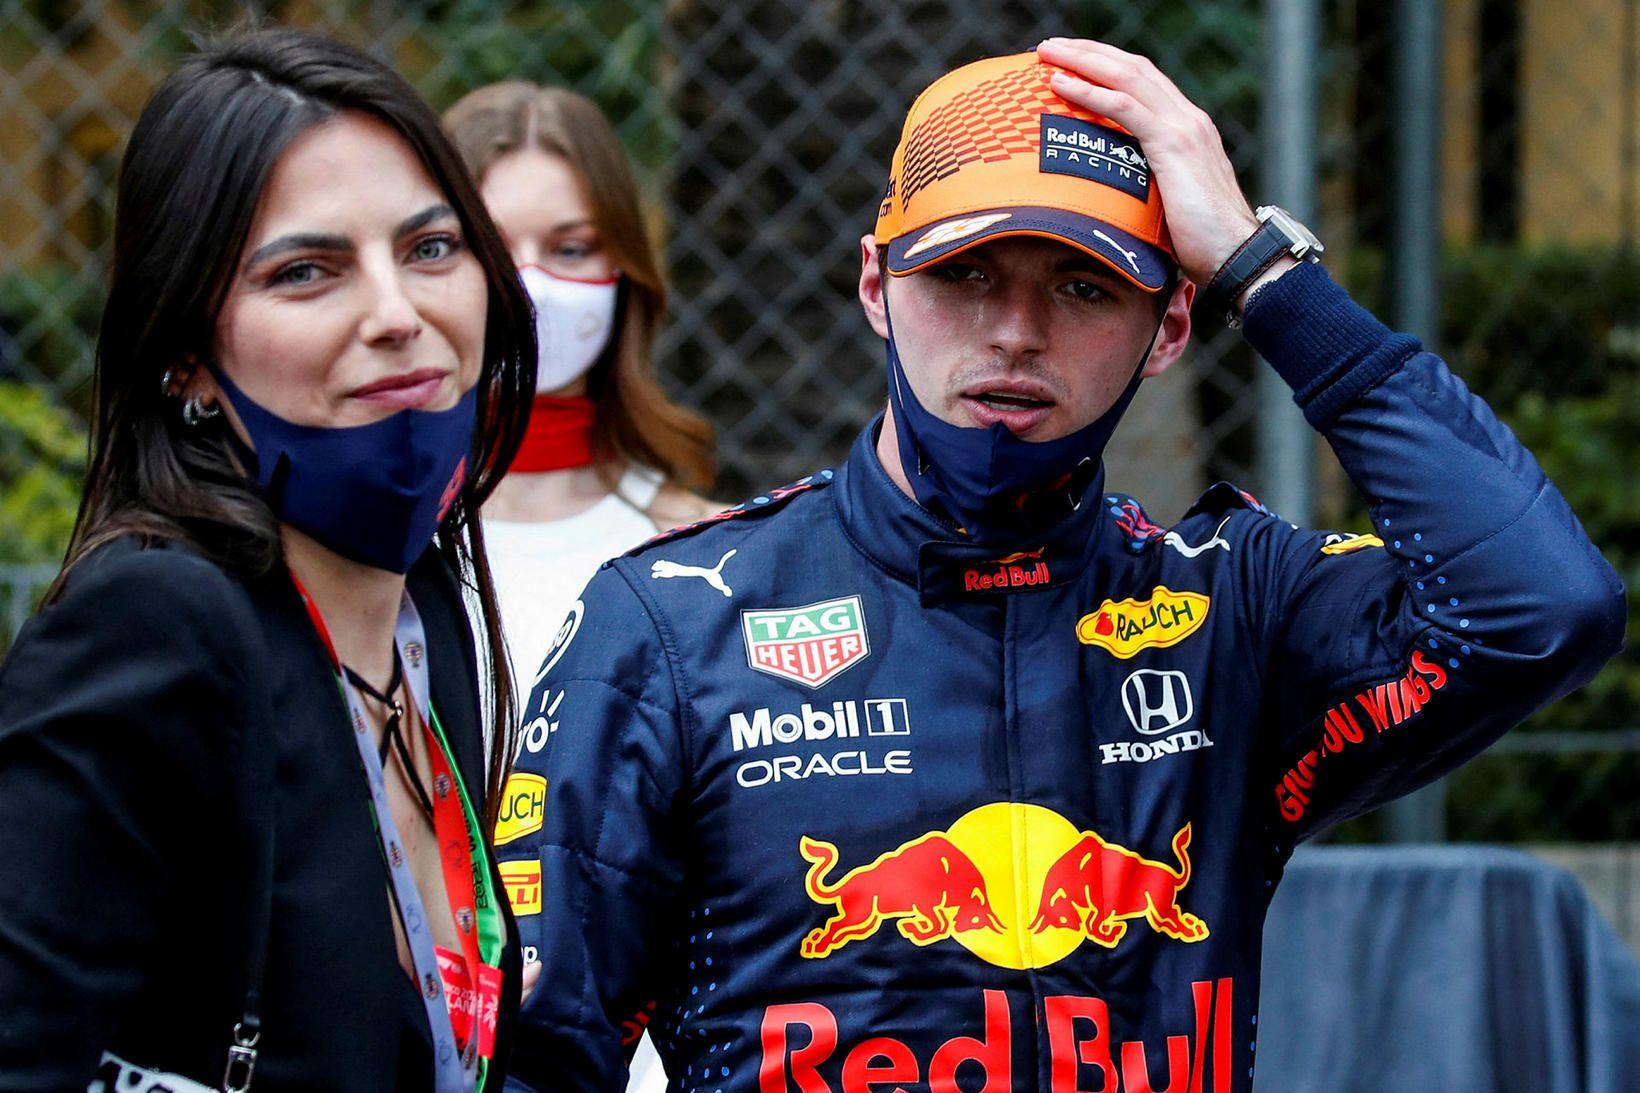 Unnusta Max Verstappen, Kelly Piquet, tók á móti honum á …